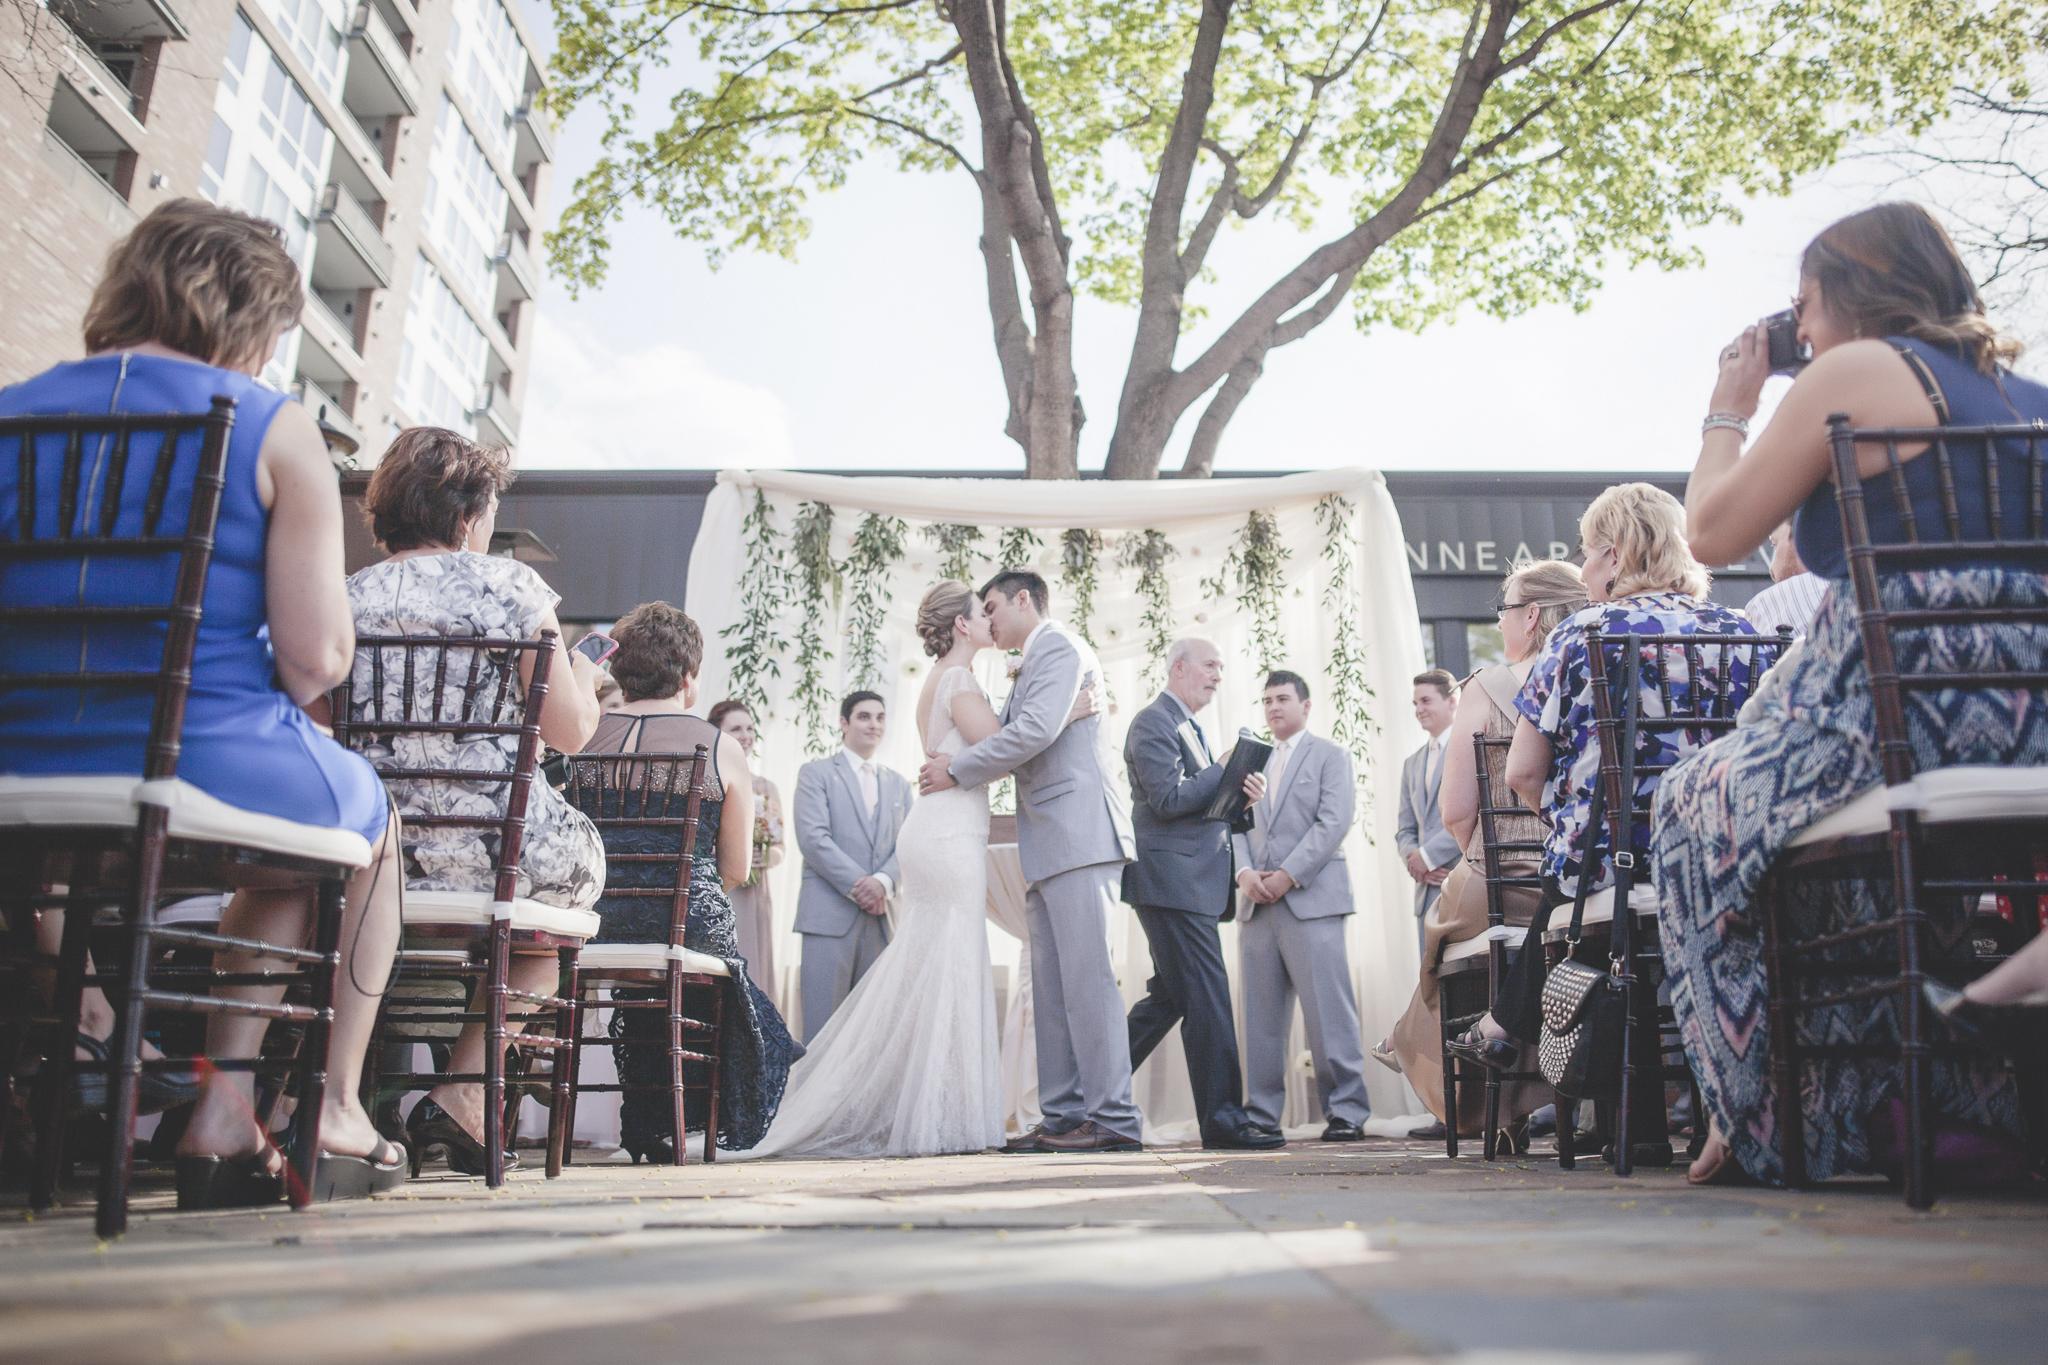 minneapolis event center wedding photographer-18.jpg